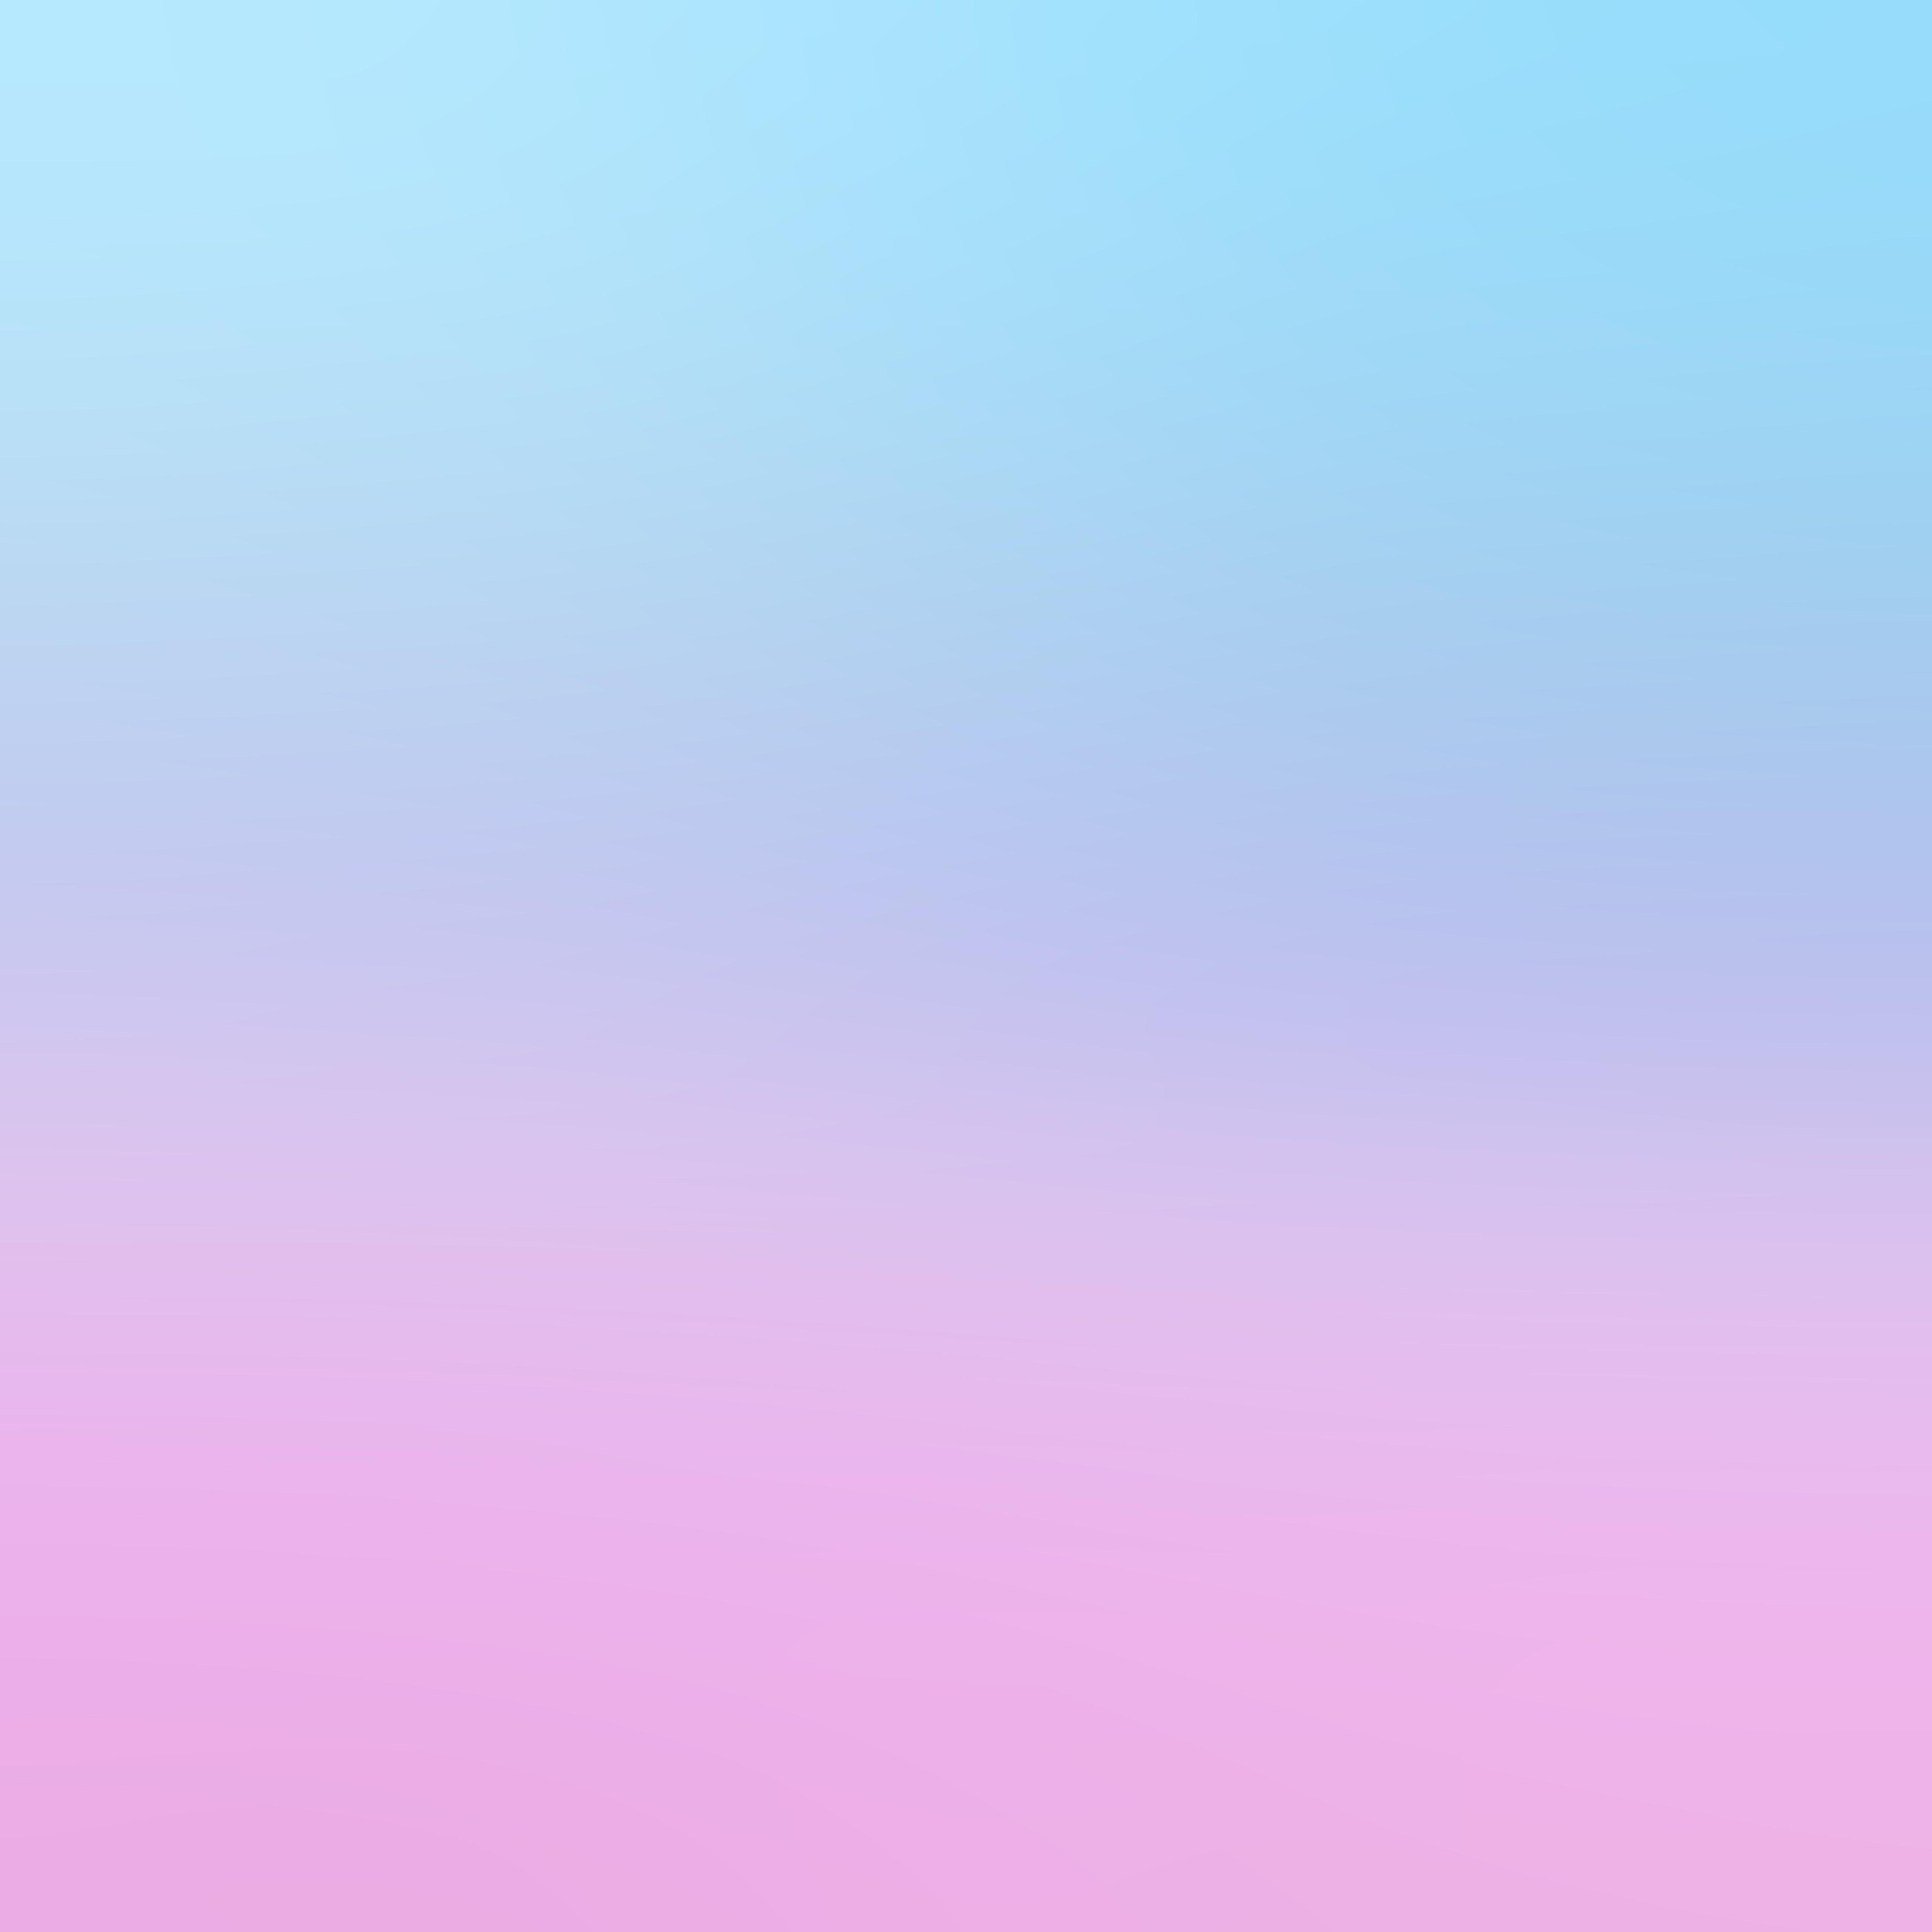 papers.co so17 soft air blur gradation 40 wallpaper